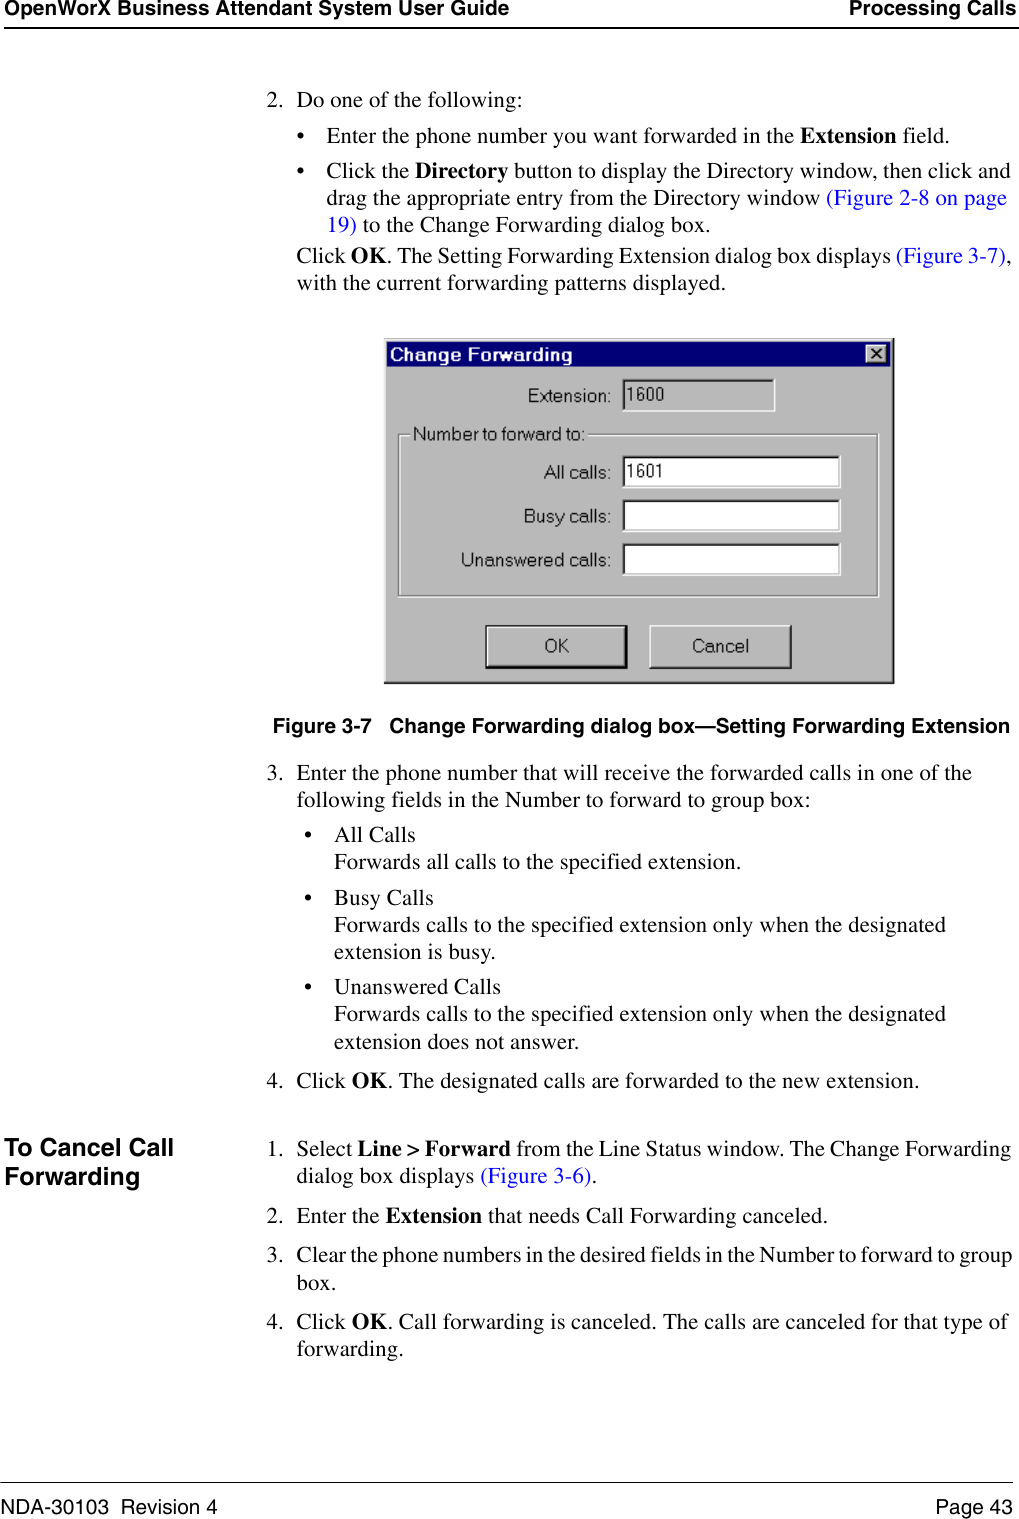 Nec Nda 30103 004 Users Manual OpenWorX Business Attendant